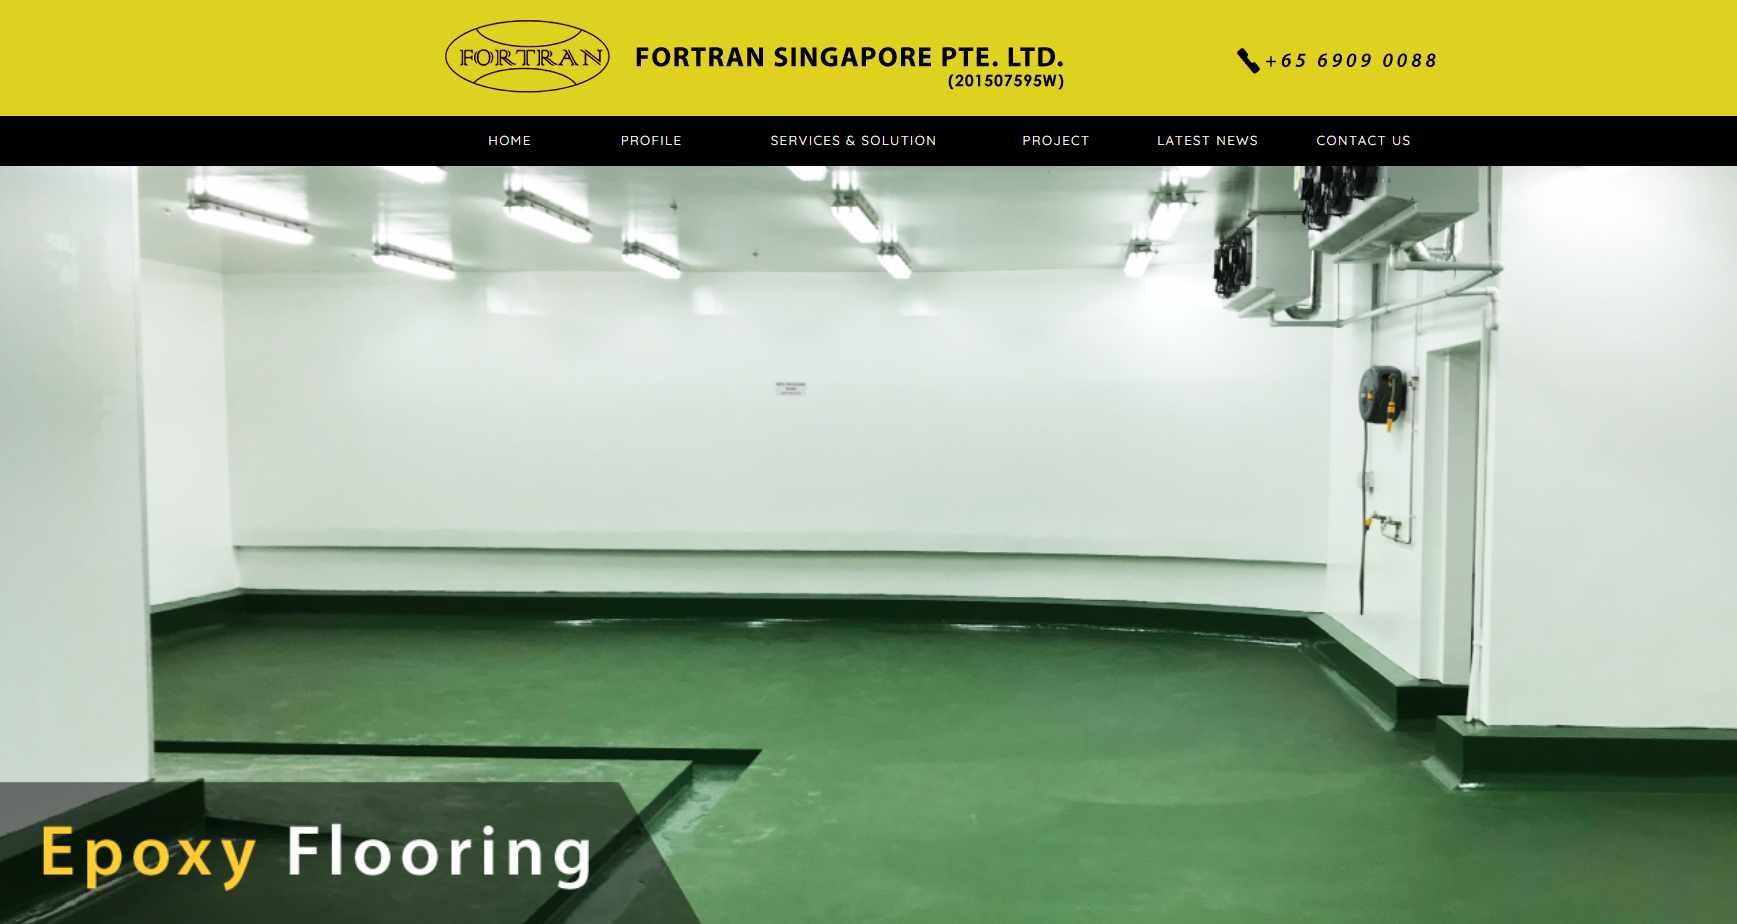 fortran singapore Top Epoxy Flooring Provider in Singapore